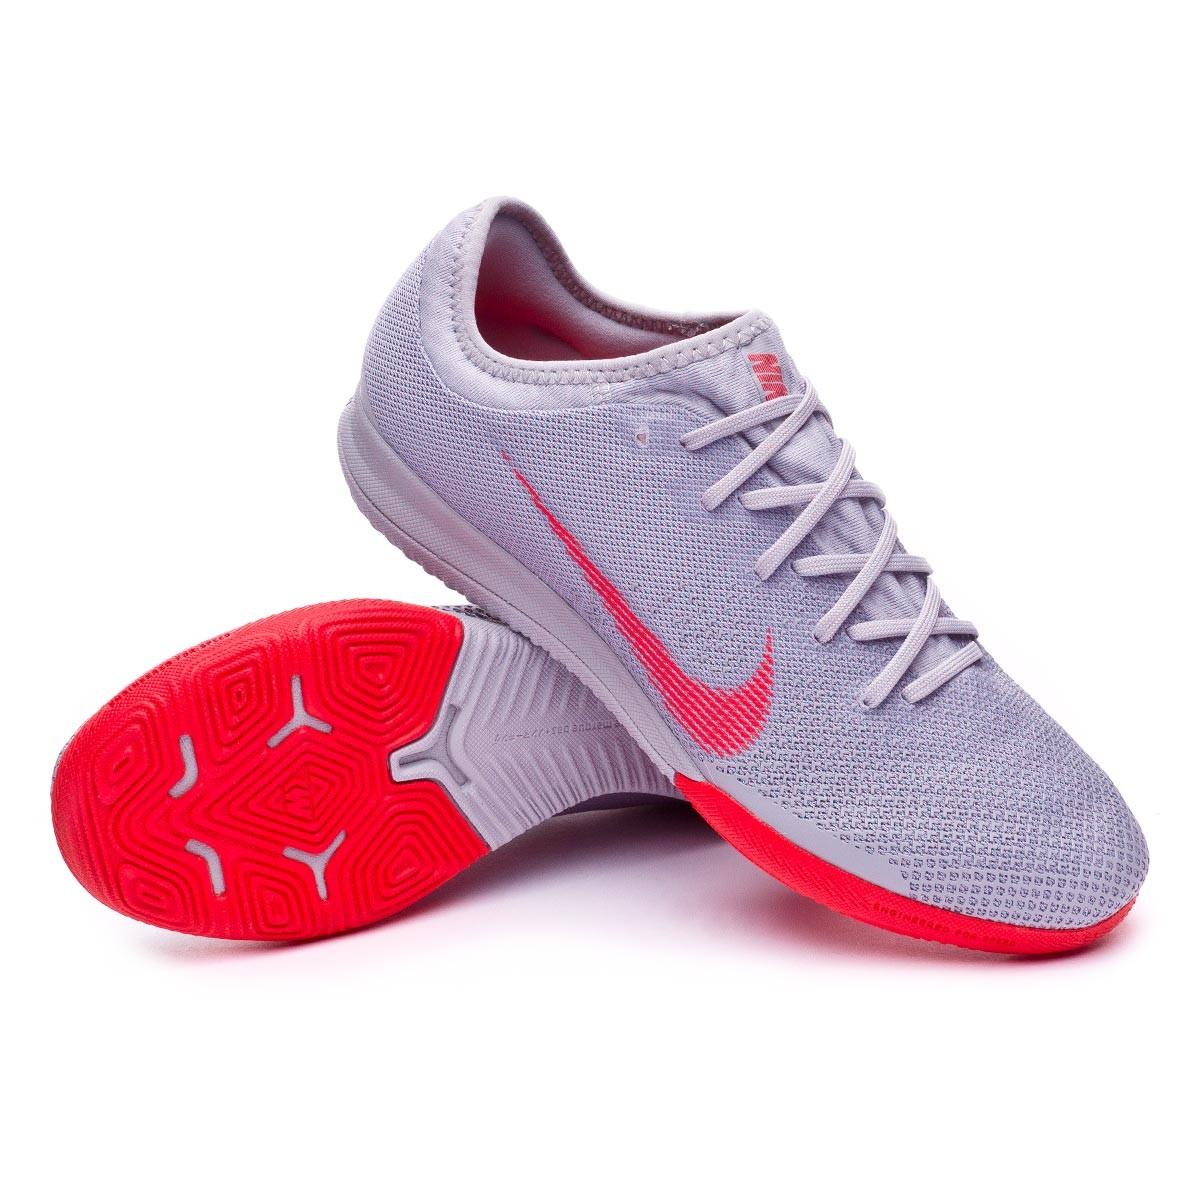 b18d61391 Futsal Boot Nike Mercurial VaporX XII Pro IC Wolf grey-Bright ...